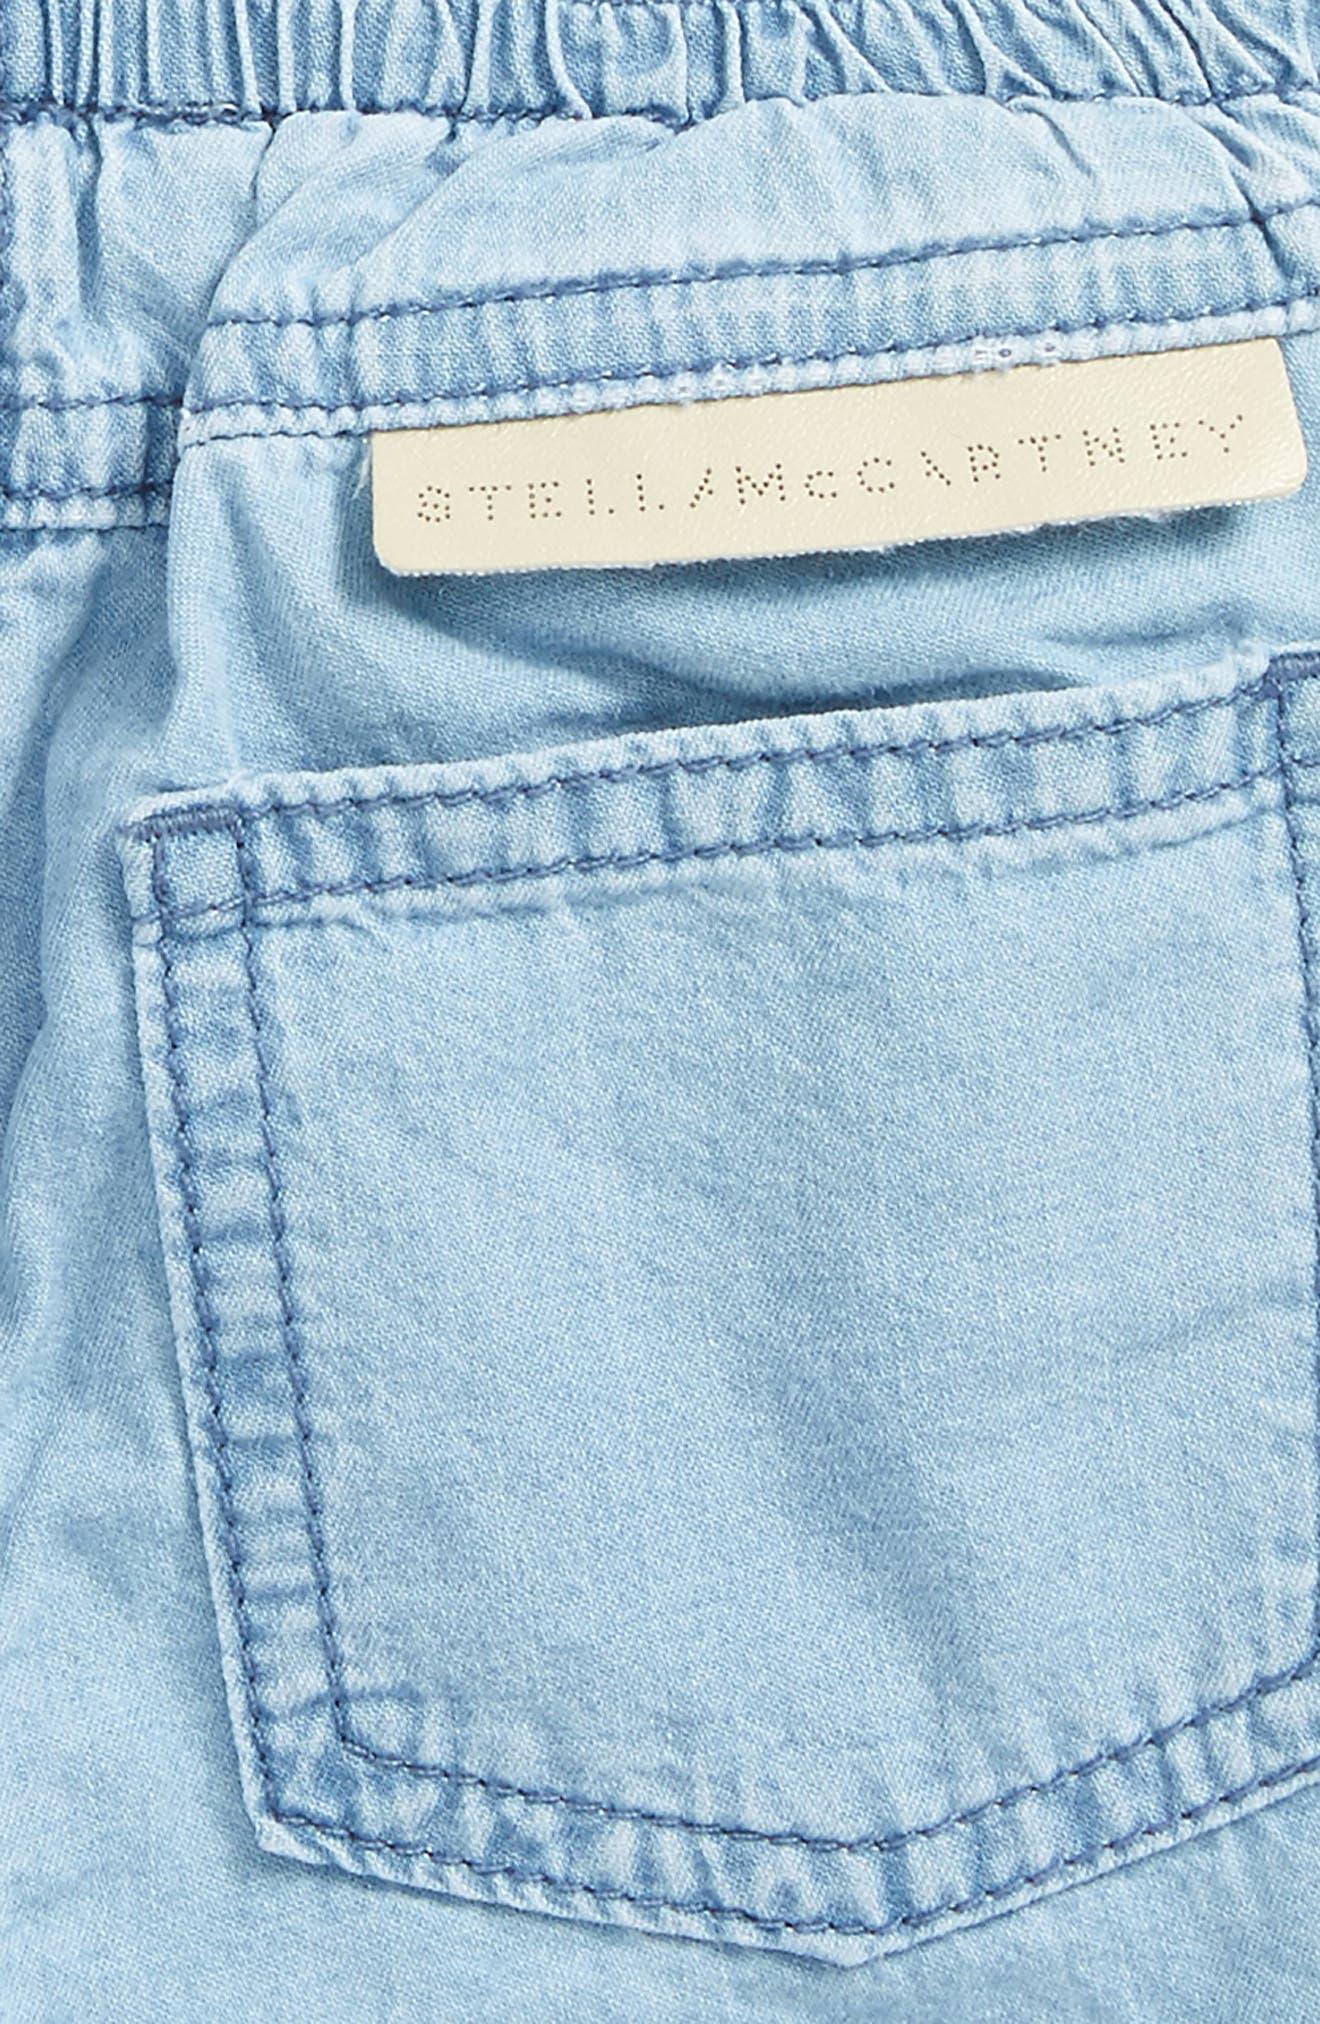 Pipkin Chambray Pants,                             Alternate thumbnail 3, color,                             Denim